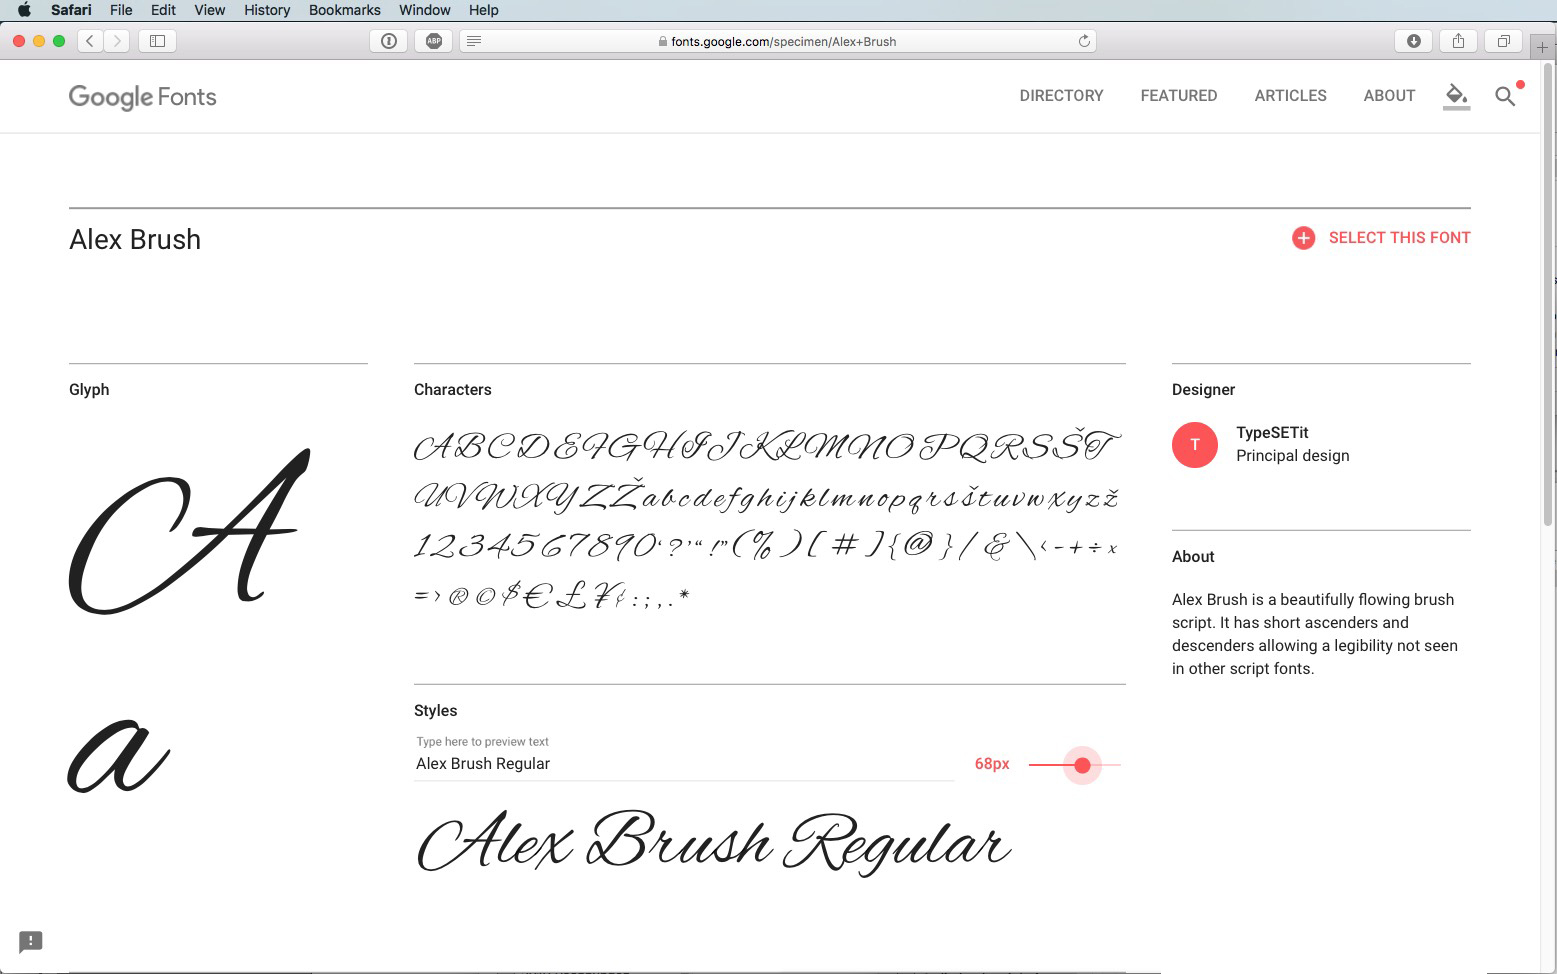 Script Font Alex Brush Regular